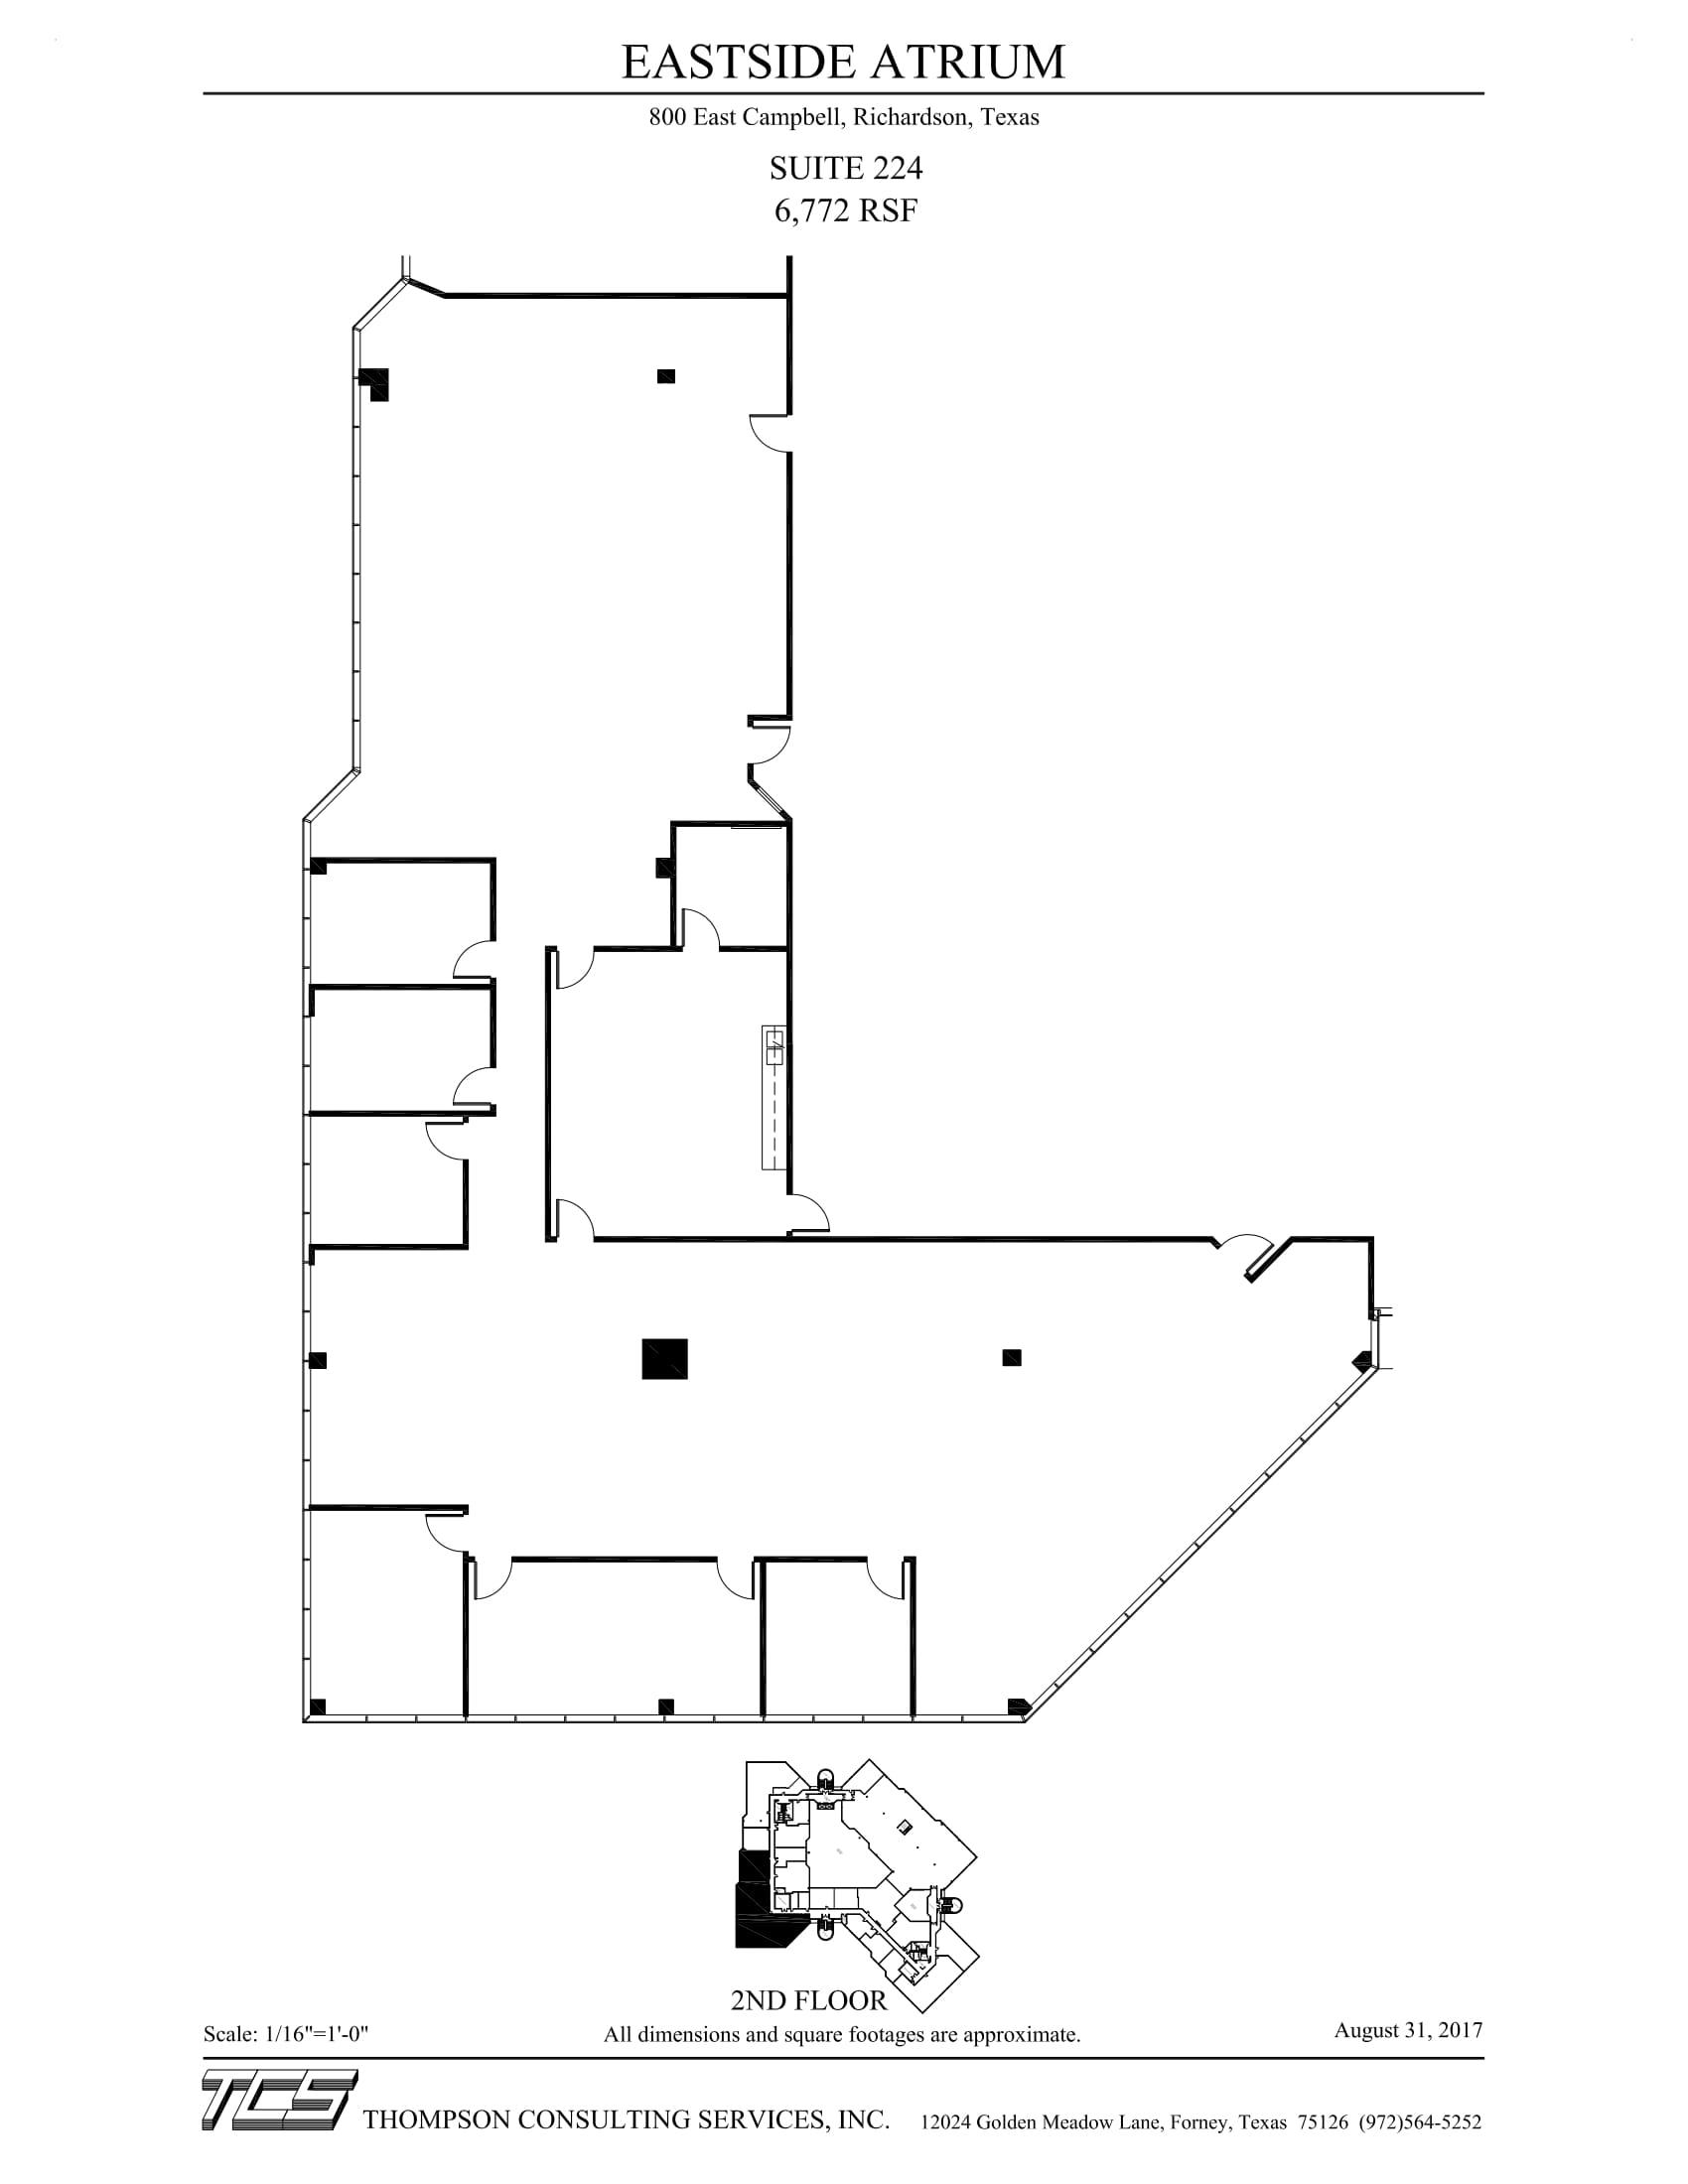 Eastside Atrium - Suite 224 - Marketing Plan-1